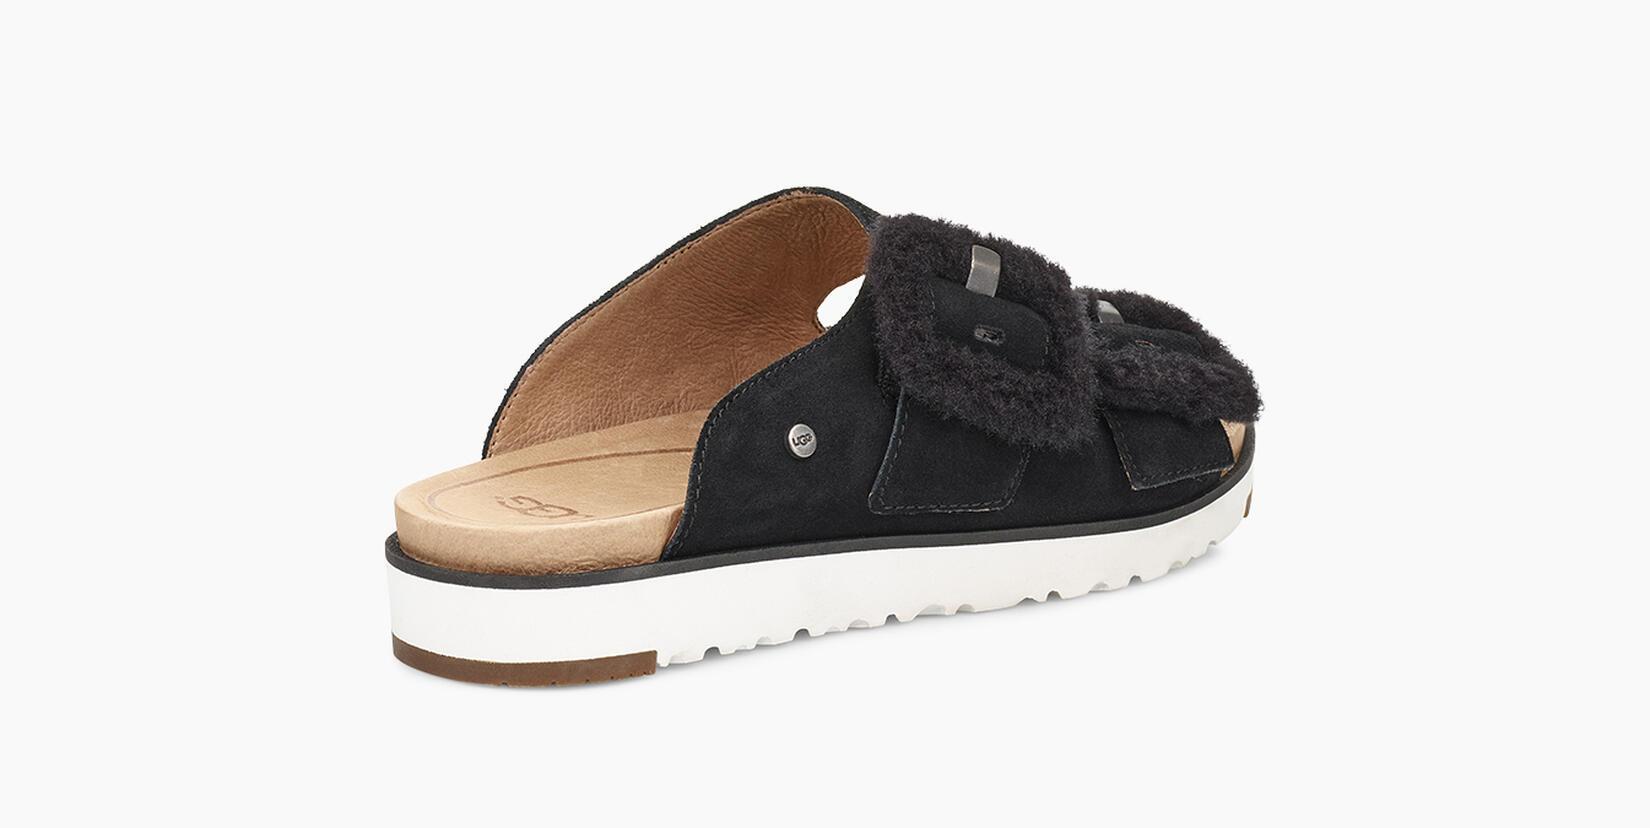 Fluff Indio Sandal